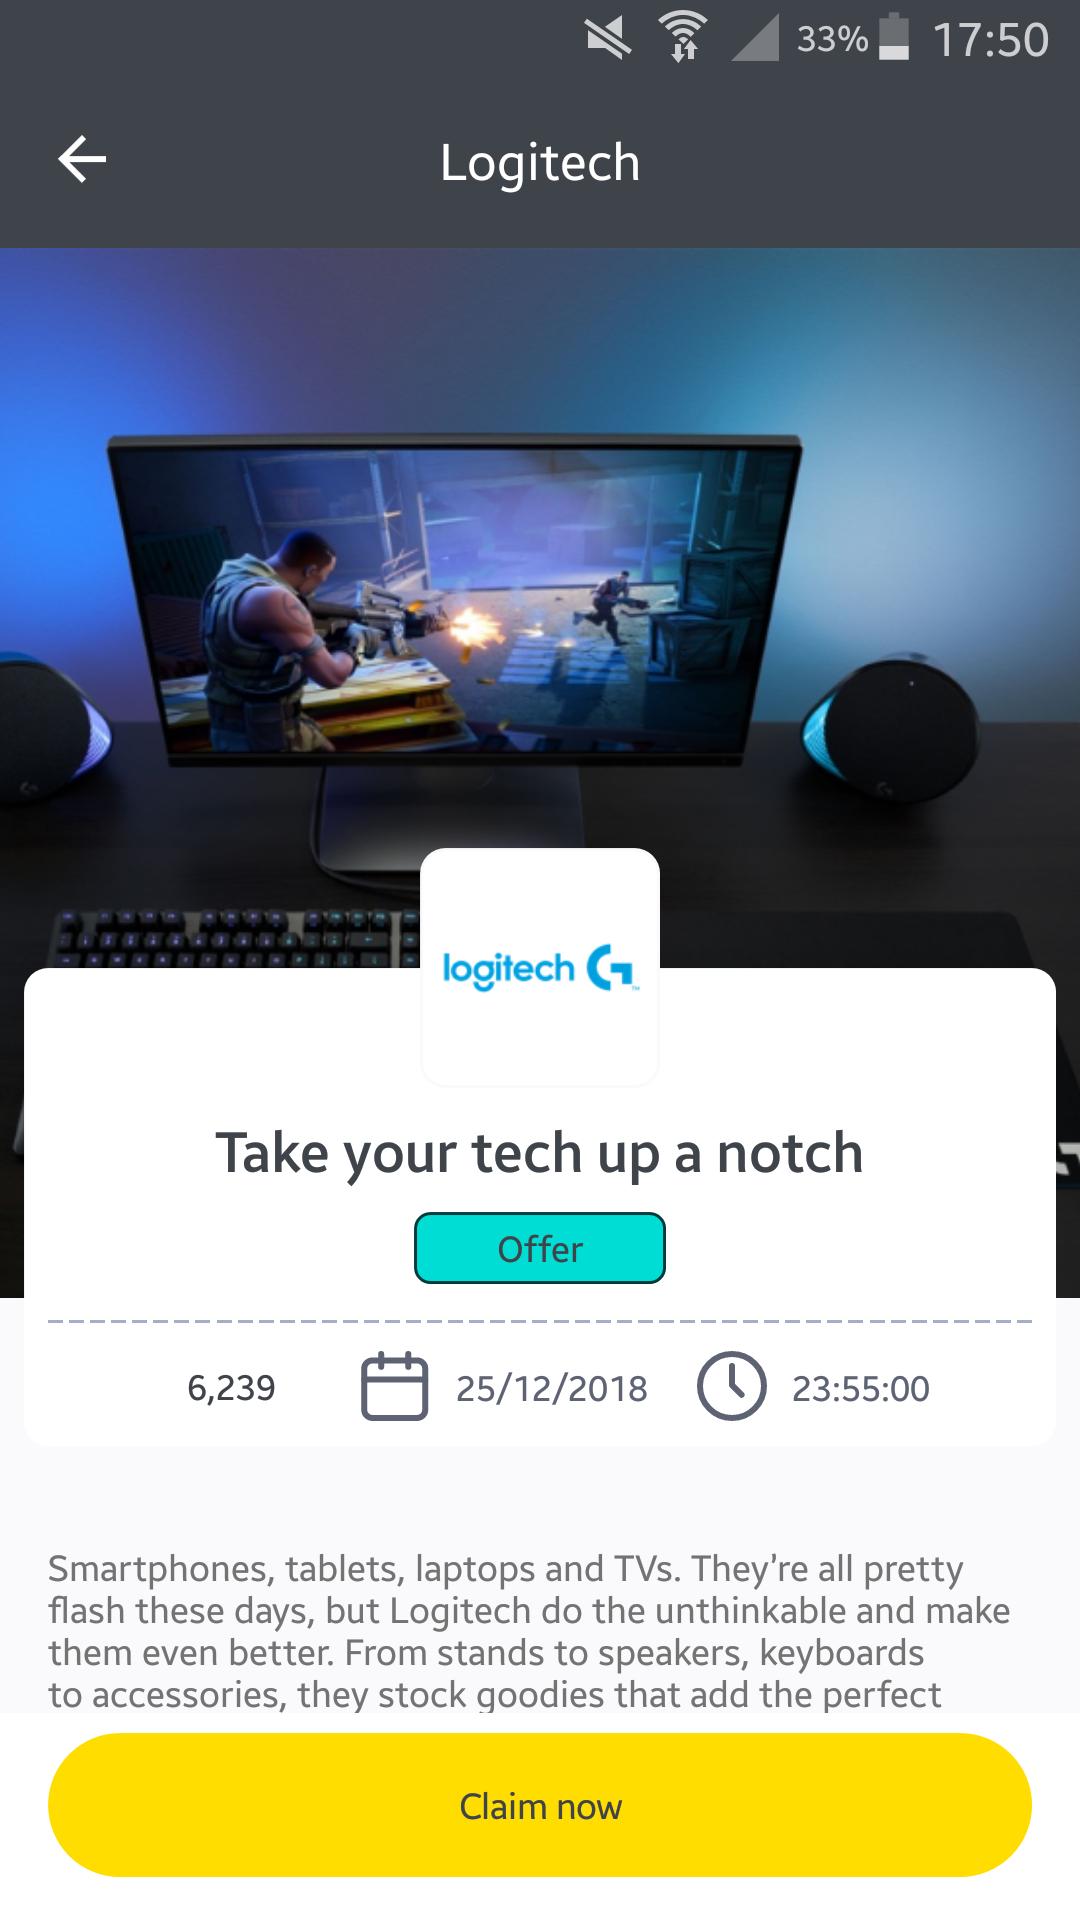 25% Off up to 3 Items on the Logitech Website - Wuntu App